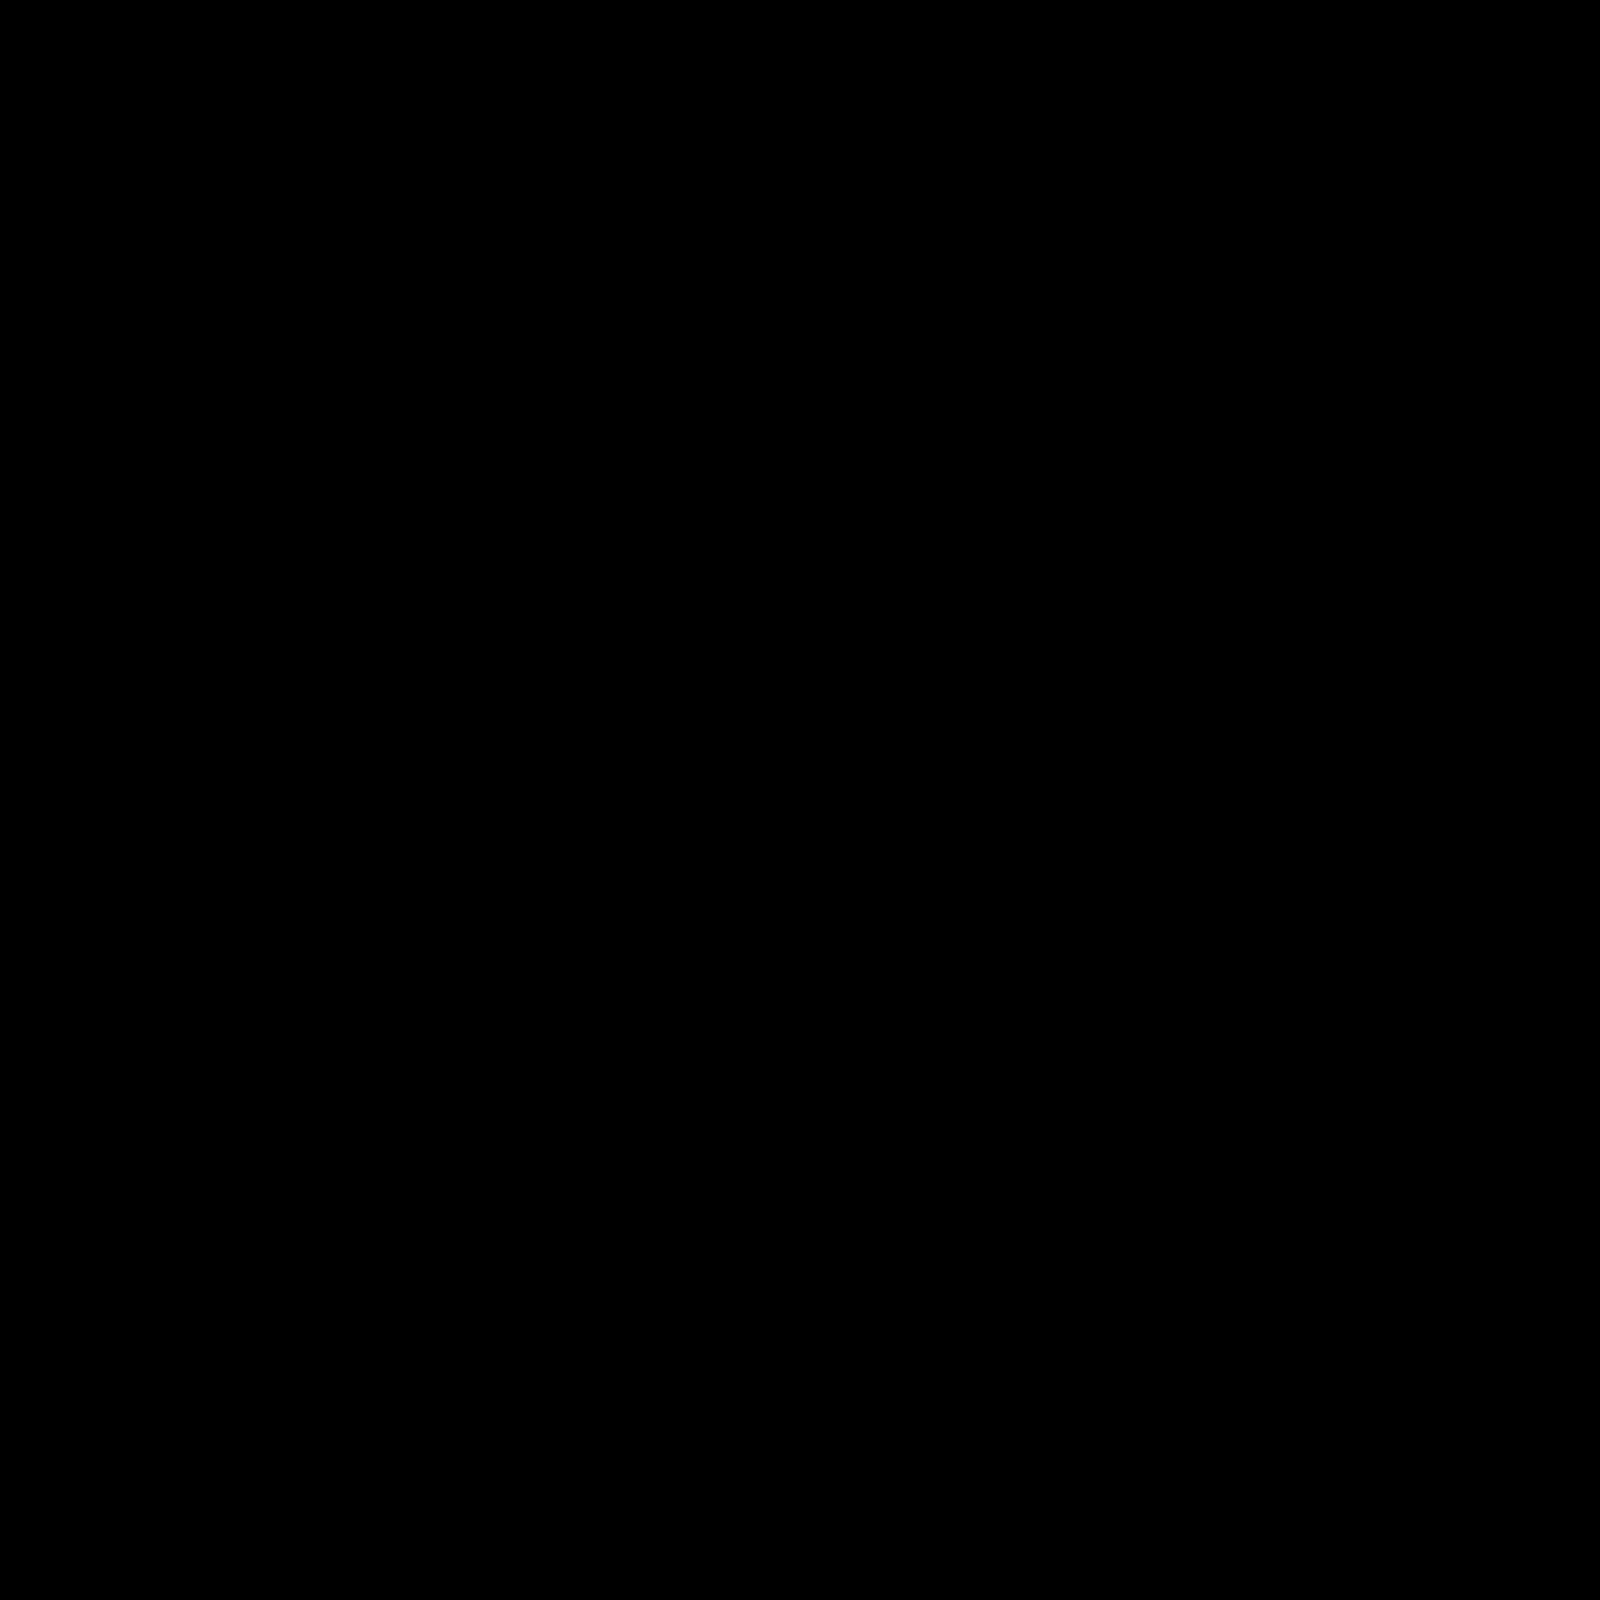 Ramka icon